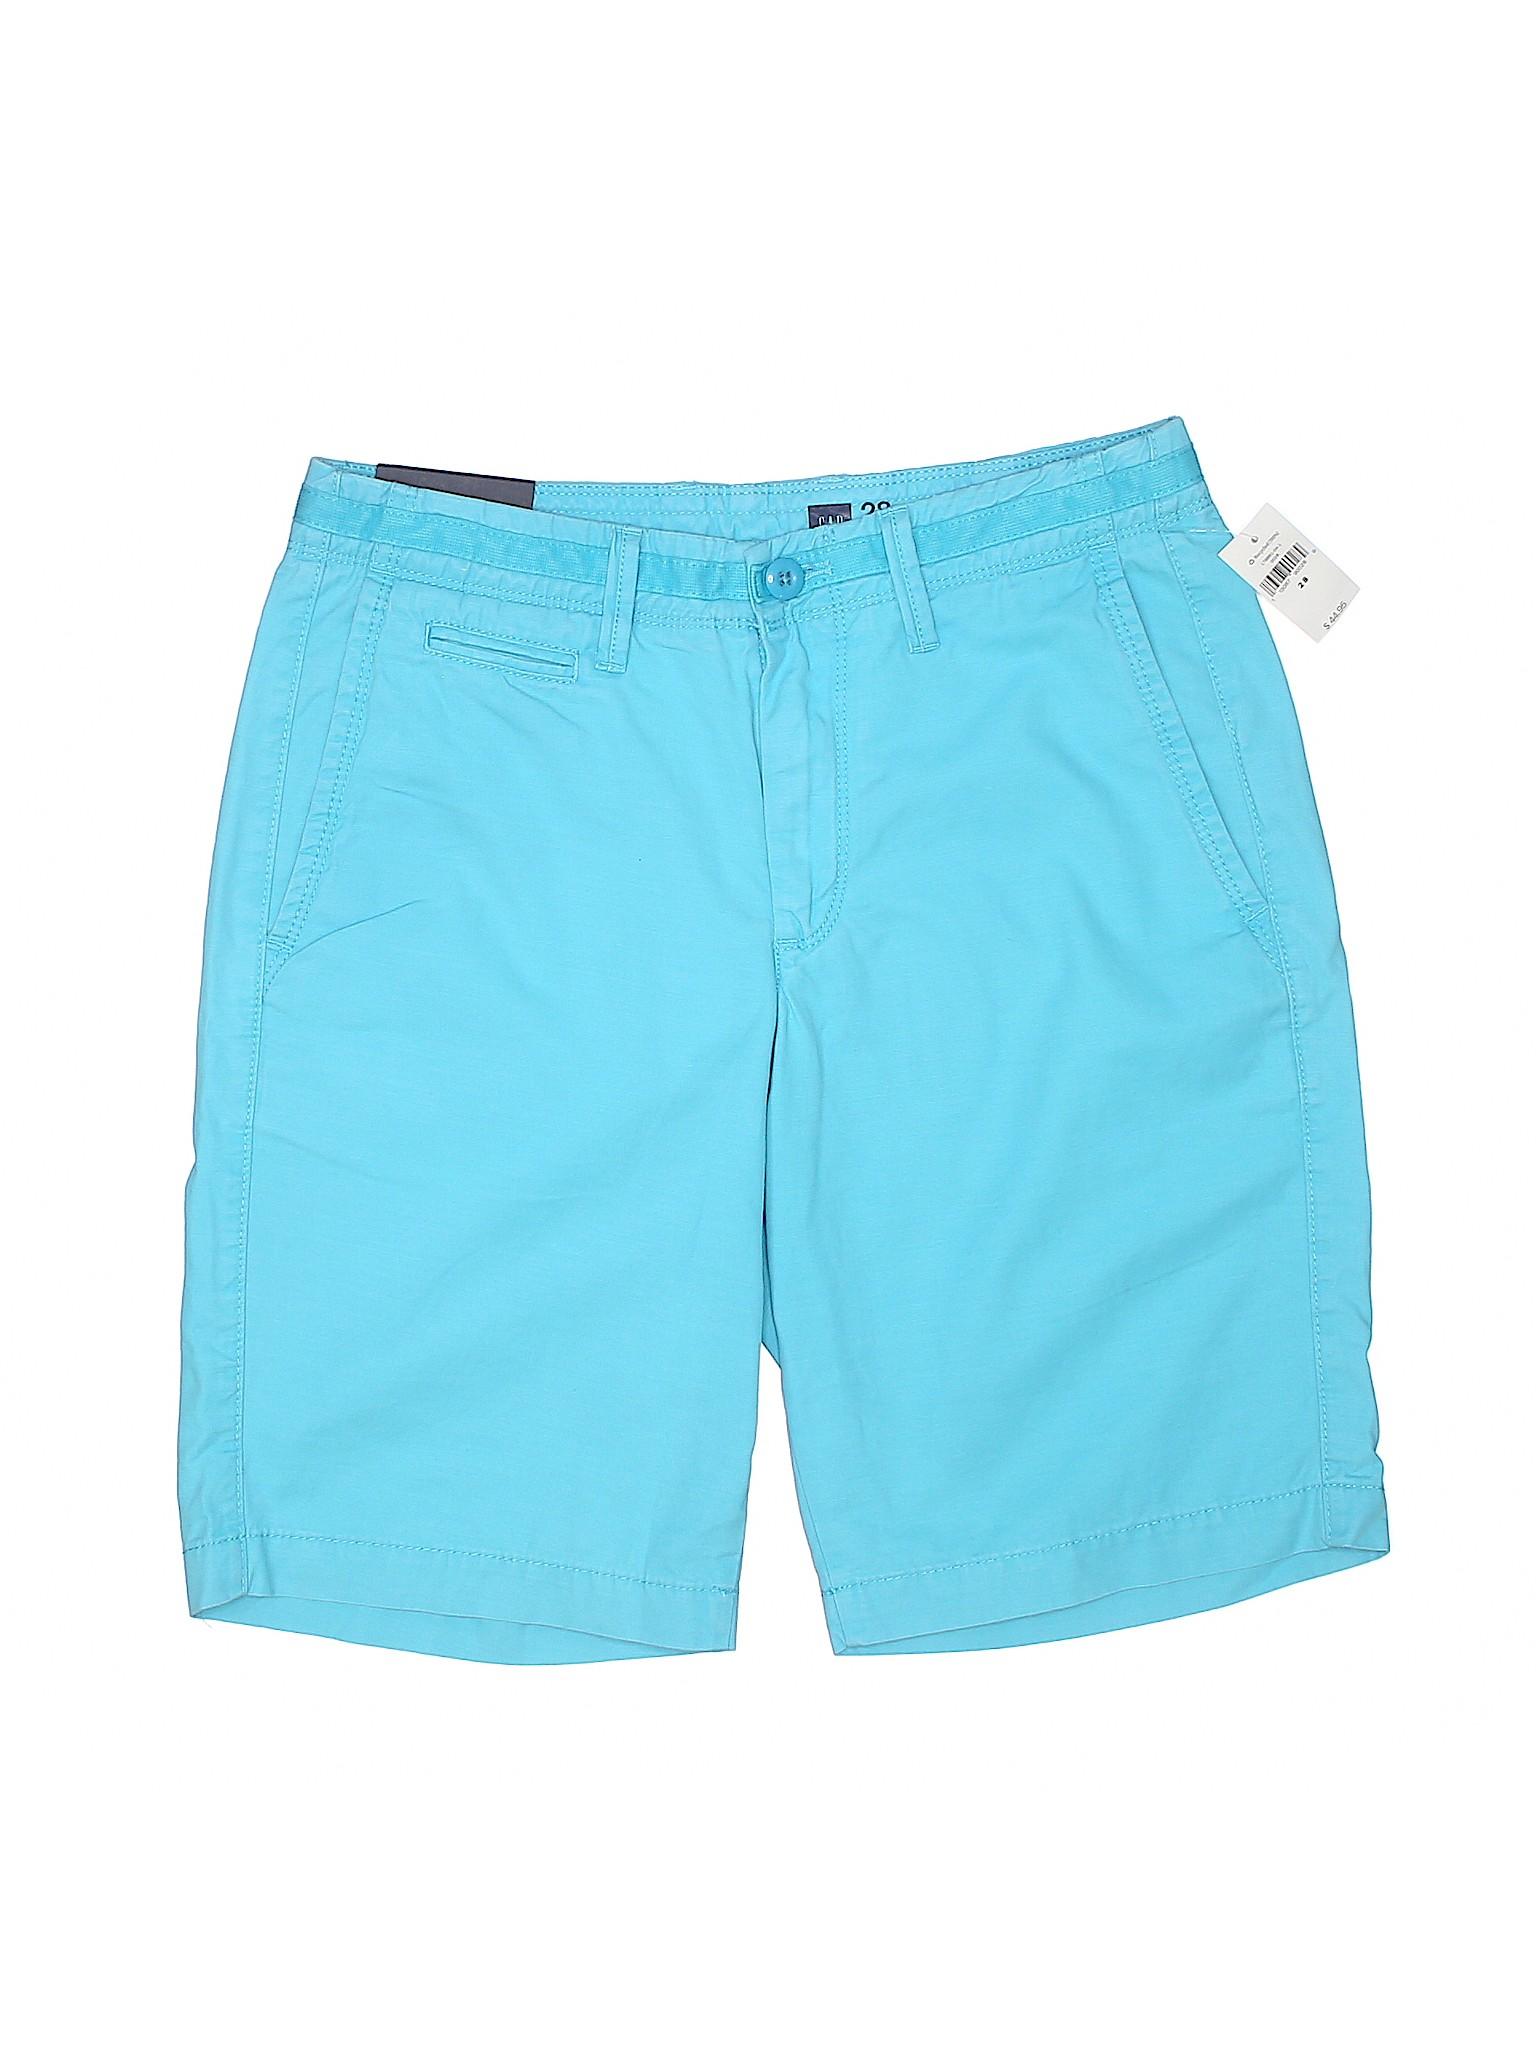 Boutique Khaki Boutique Shorts Gap Shorts Khaki Gap Boutique YRqBII